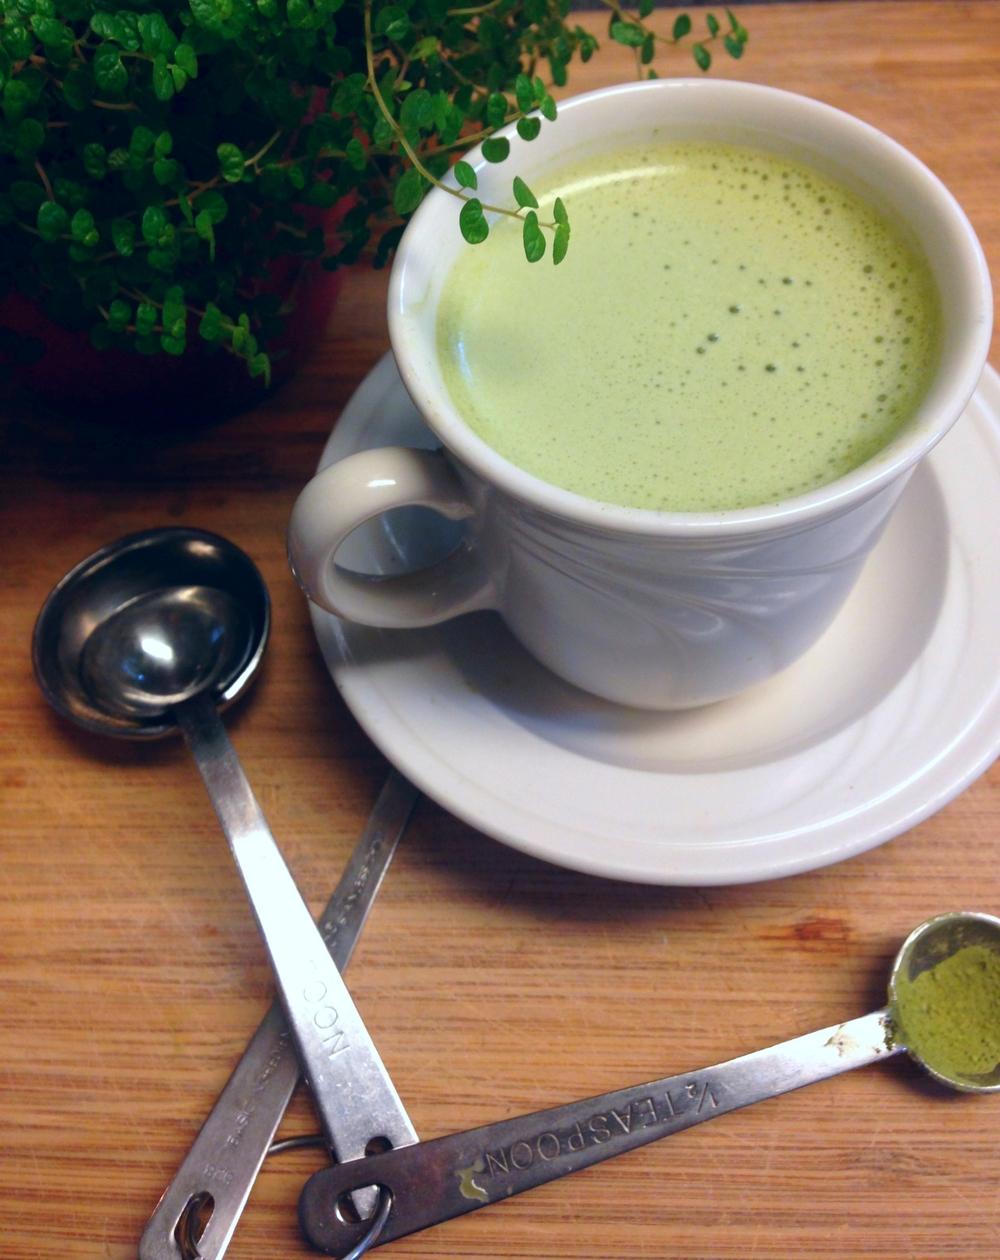 coconut milk matcha latte with organic coconut milk, gluten free, dairy free, vegan